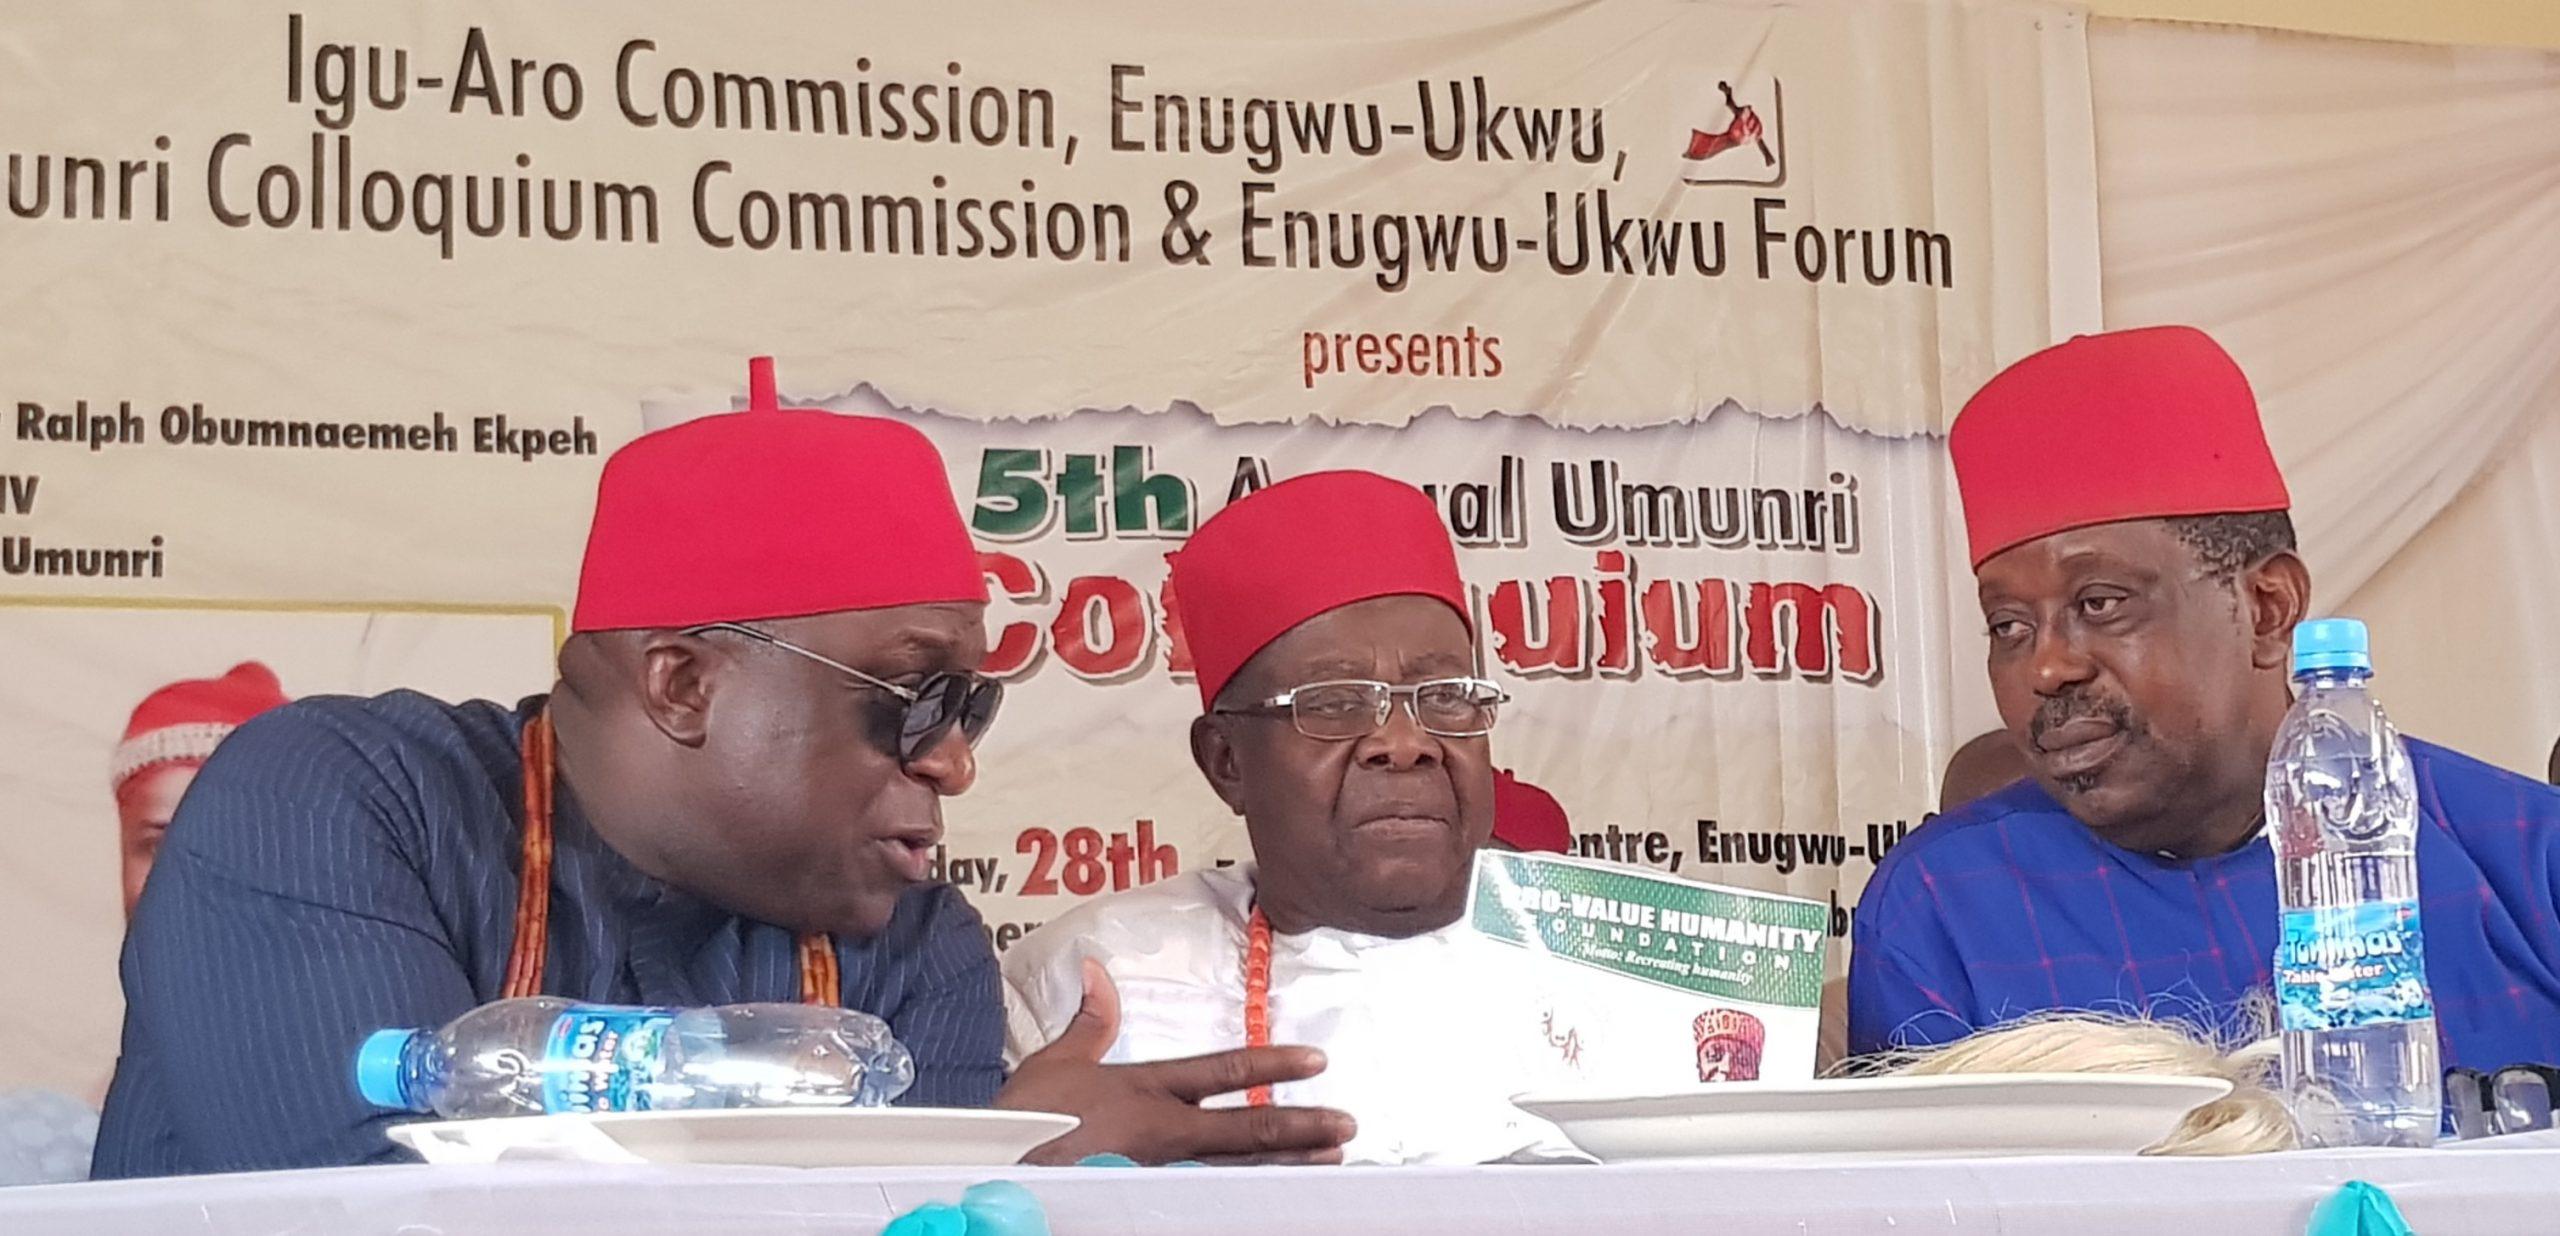 Okonkwo's Solution To The Igbo Leadership Question